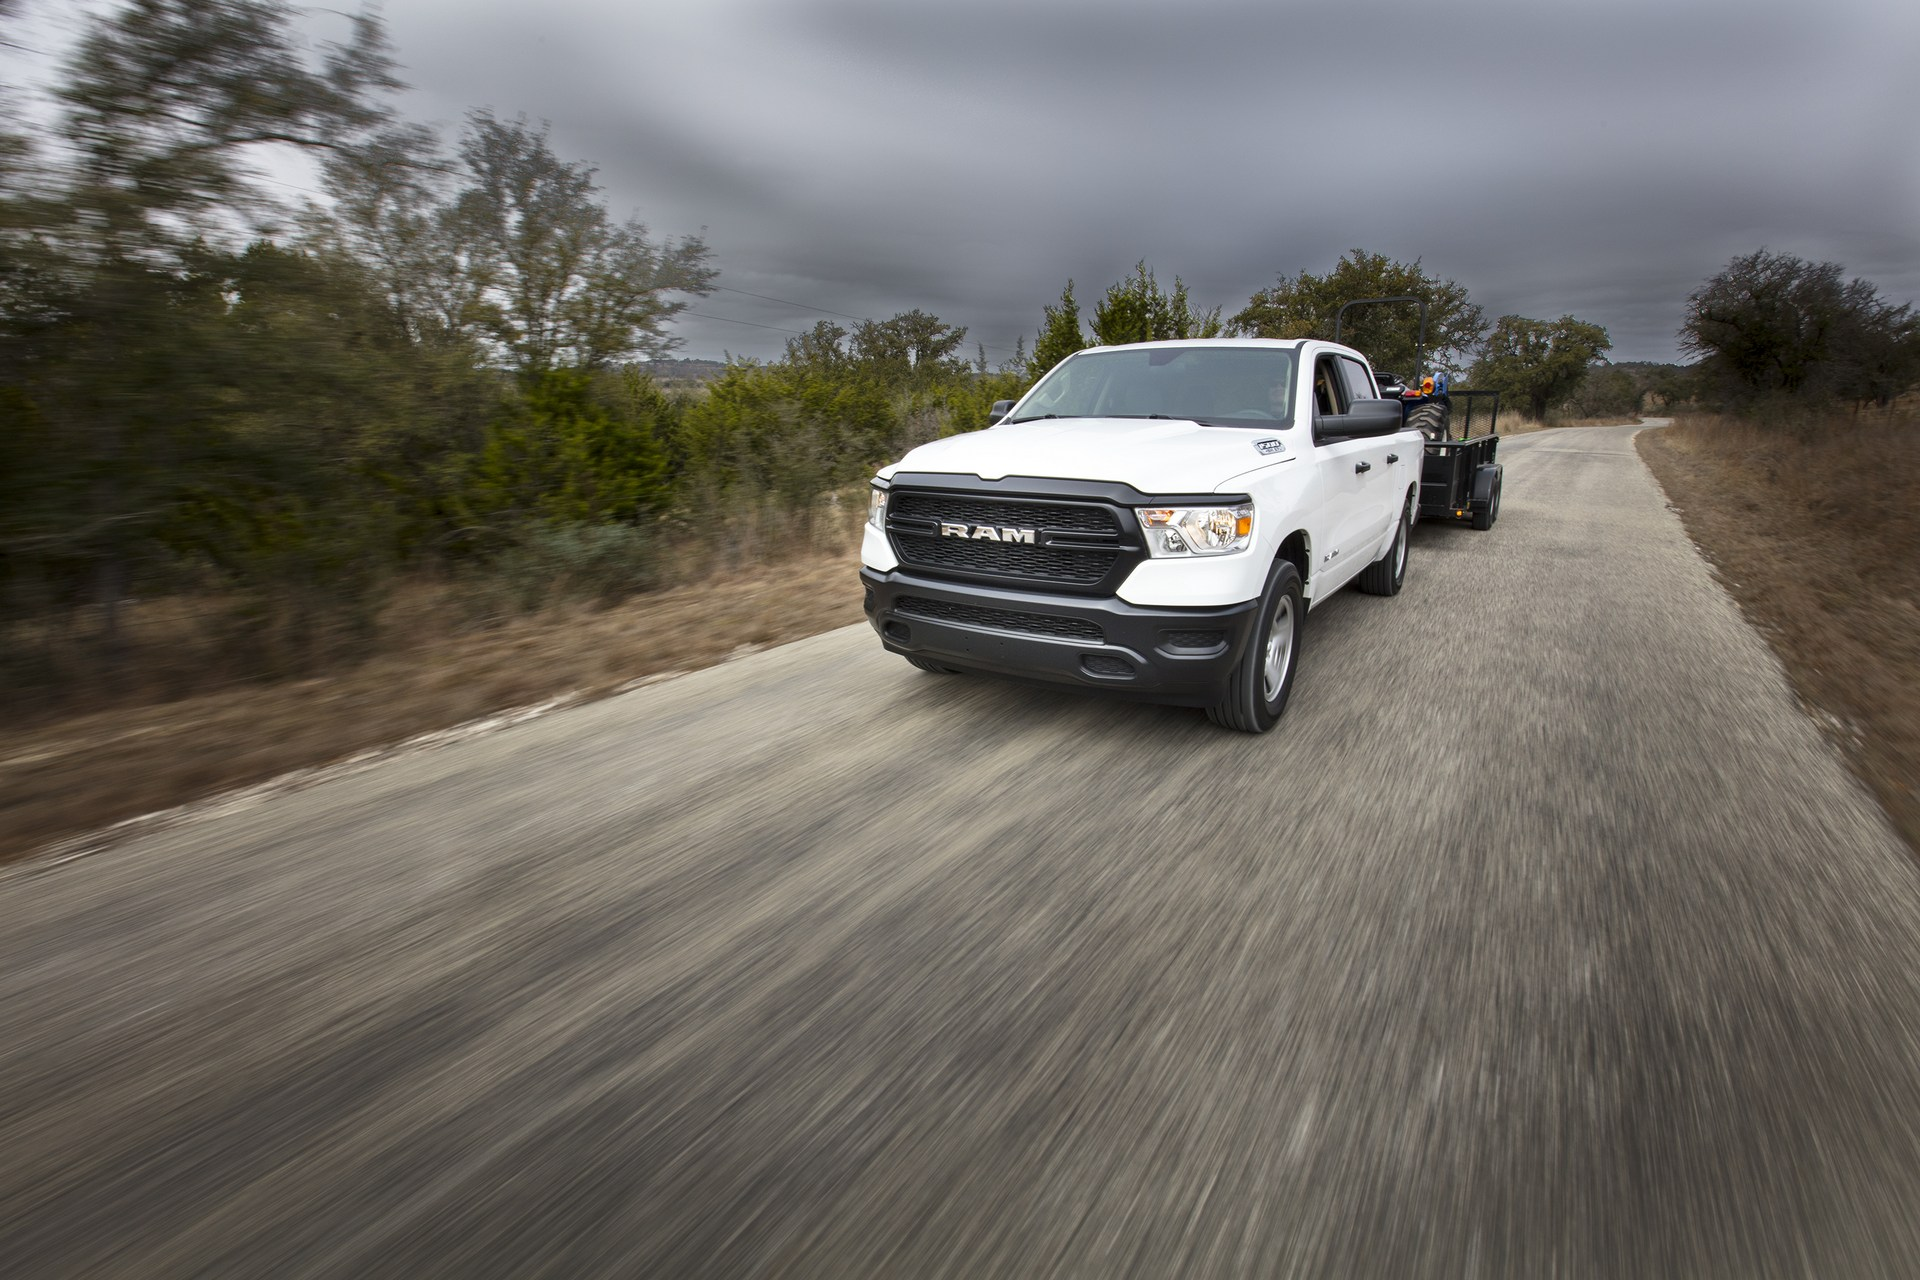 2019 Ram 1500 Tradesman Debuts With Standard Mild-Hybrid ...